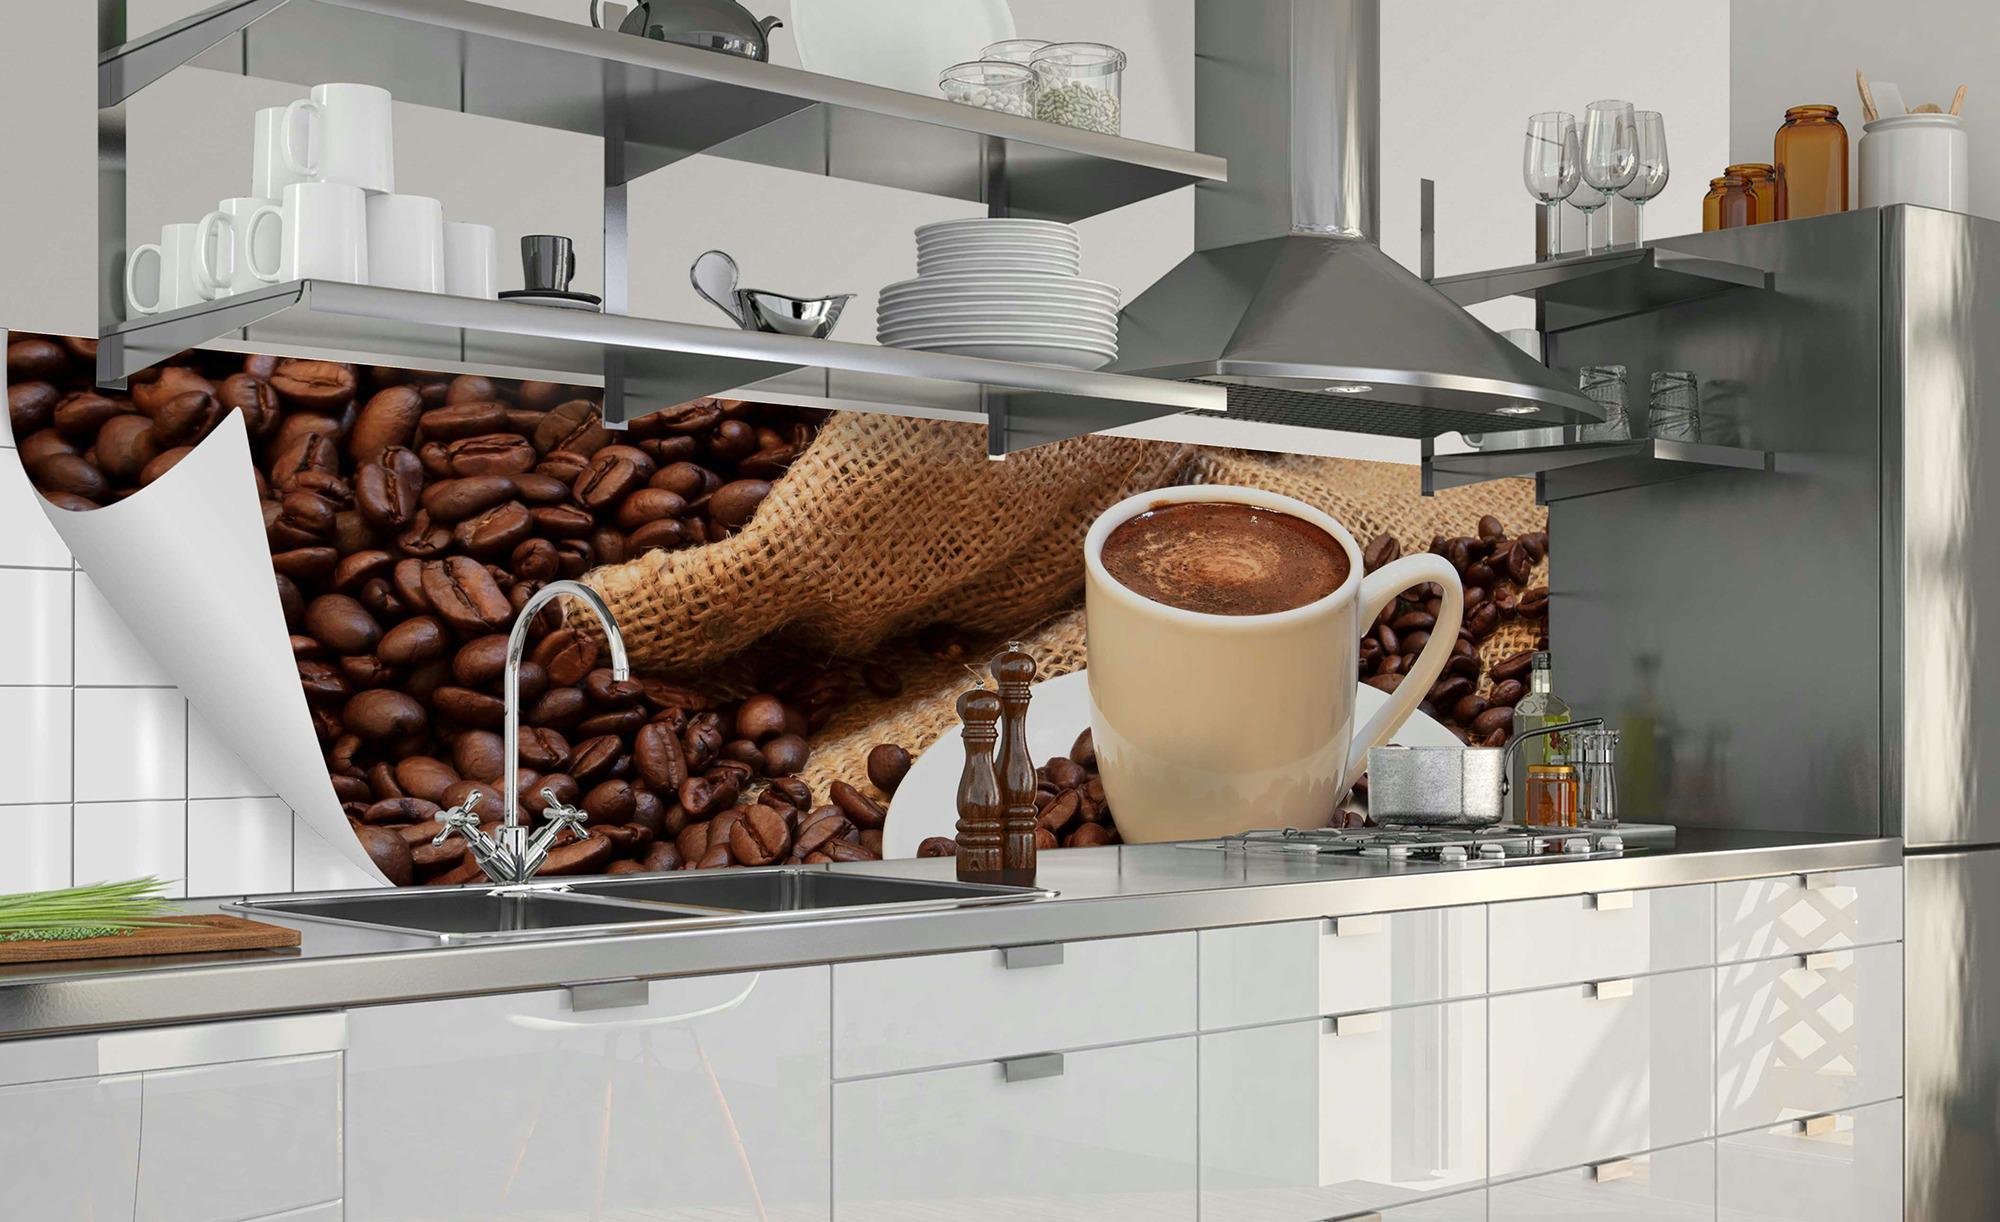 Küchenrückwand-Folie Fixy Kaffeepause - Sconto